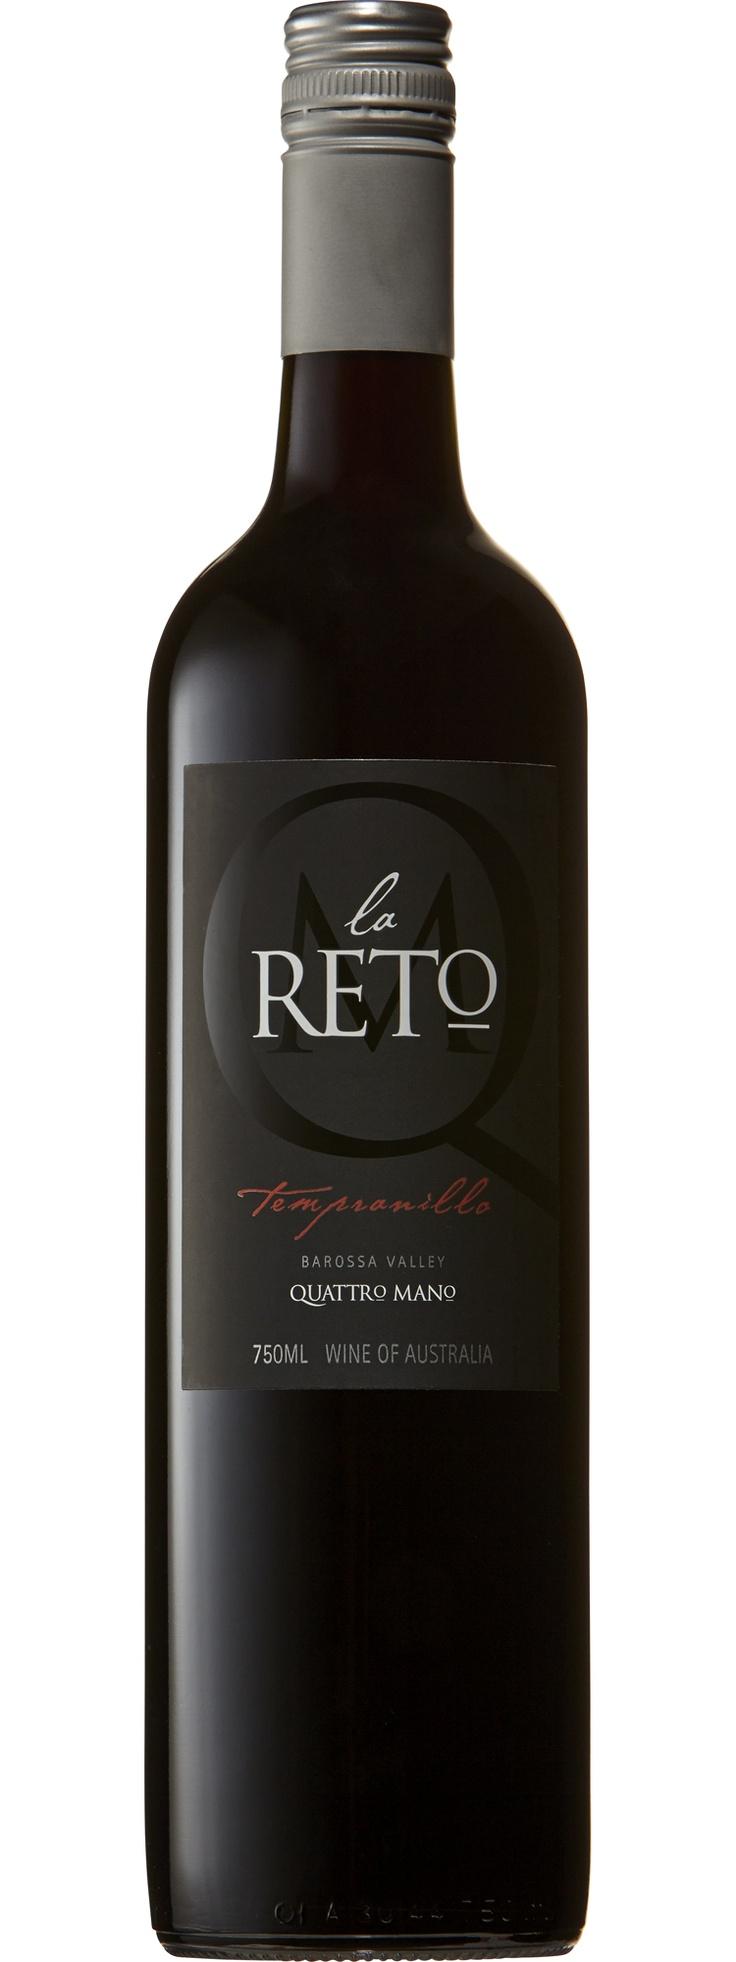 Quattro Mano La Reto Tempranillo   Dan Murphy's   Buy Wine, Champagne, Beer & Spirits Online